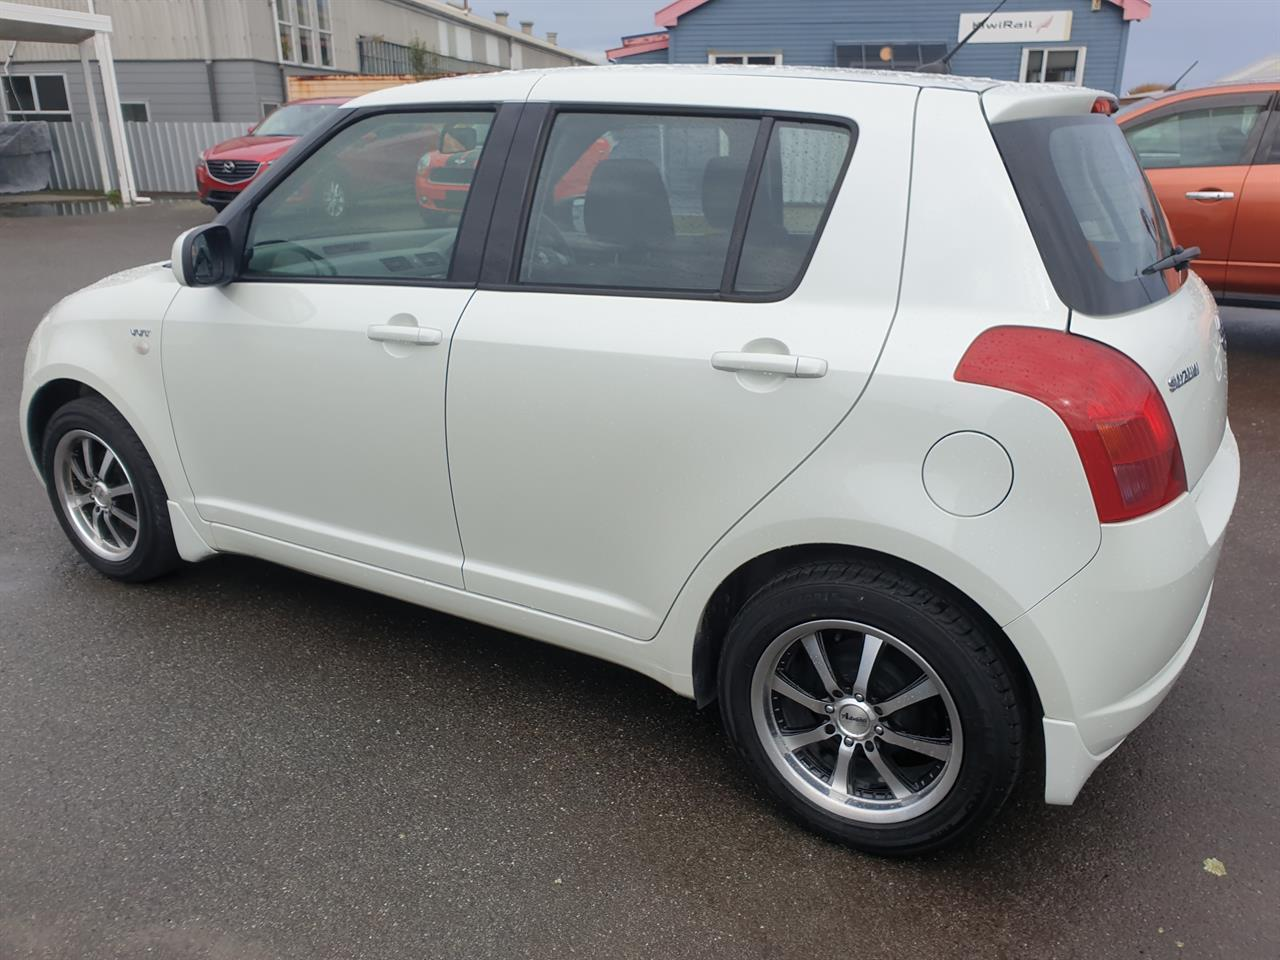 image-5, 2007 Suzuki Swift GLXHA 1.5 5DR at Greymouth